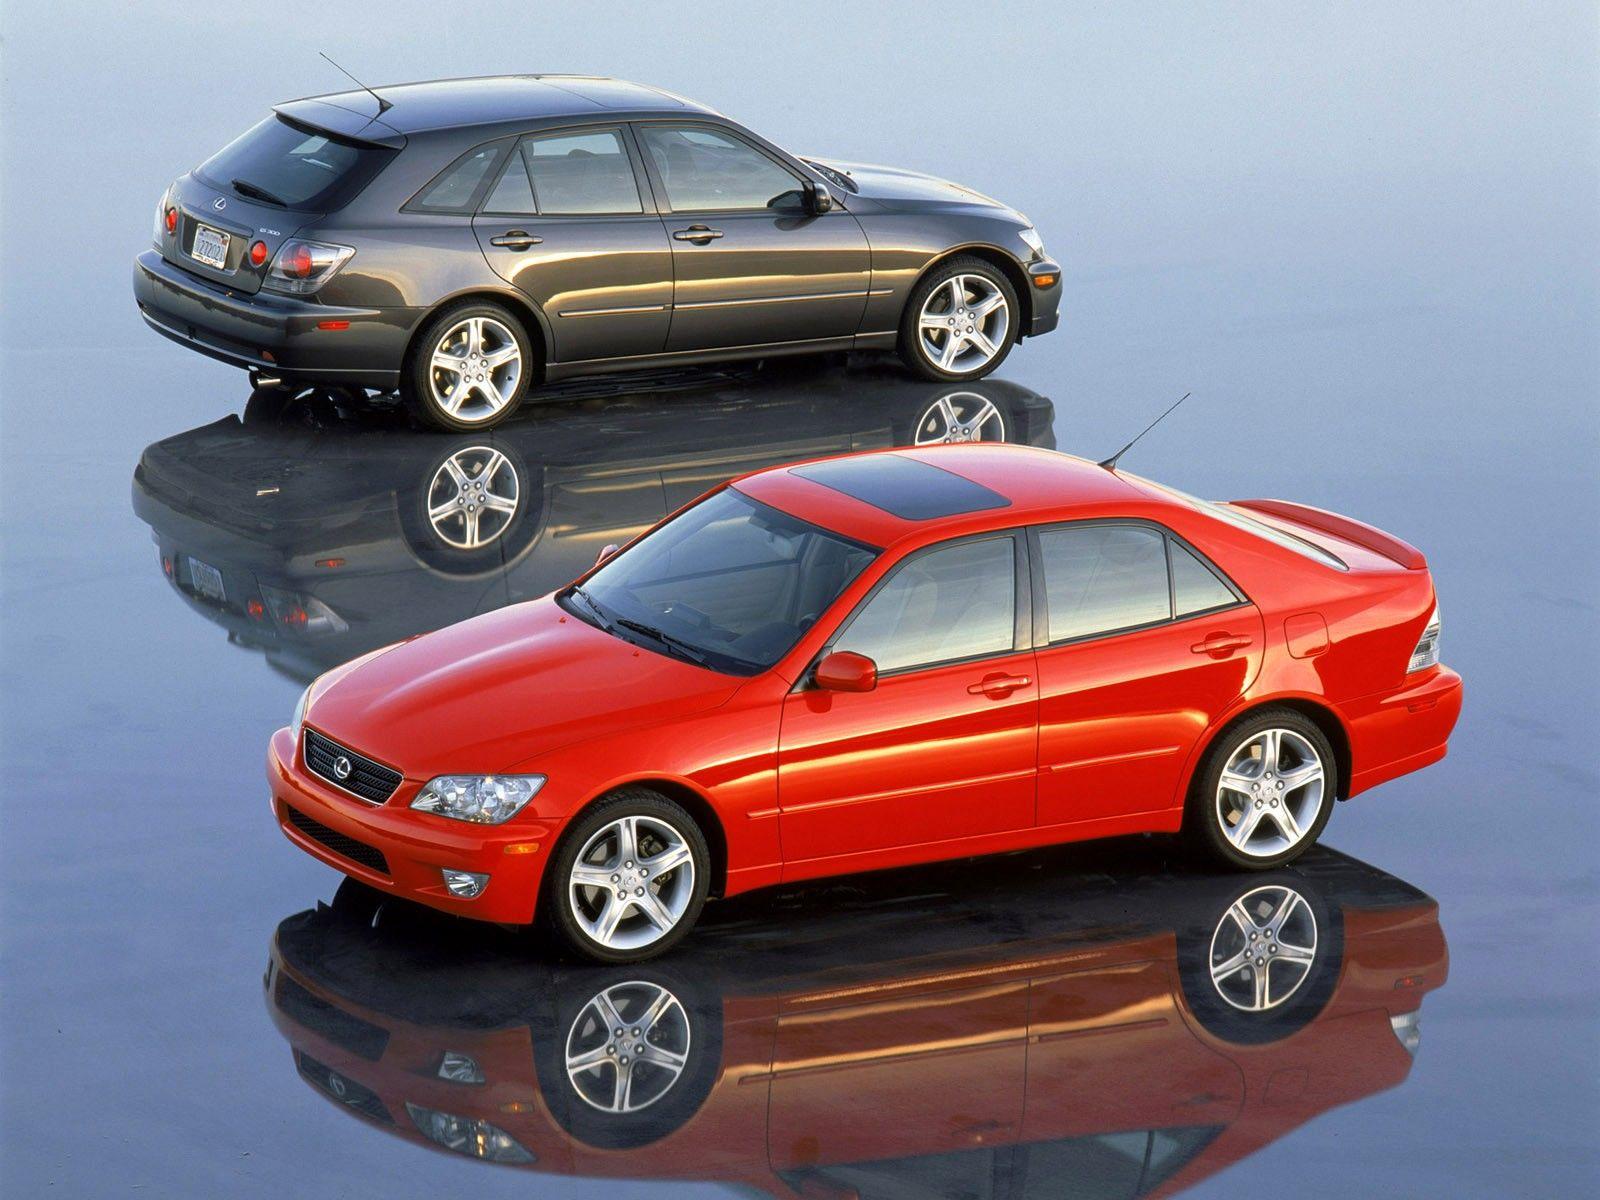 Lexus IS200 Lexus is300, Lexus cars, Datsun 510